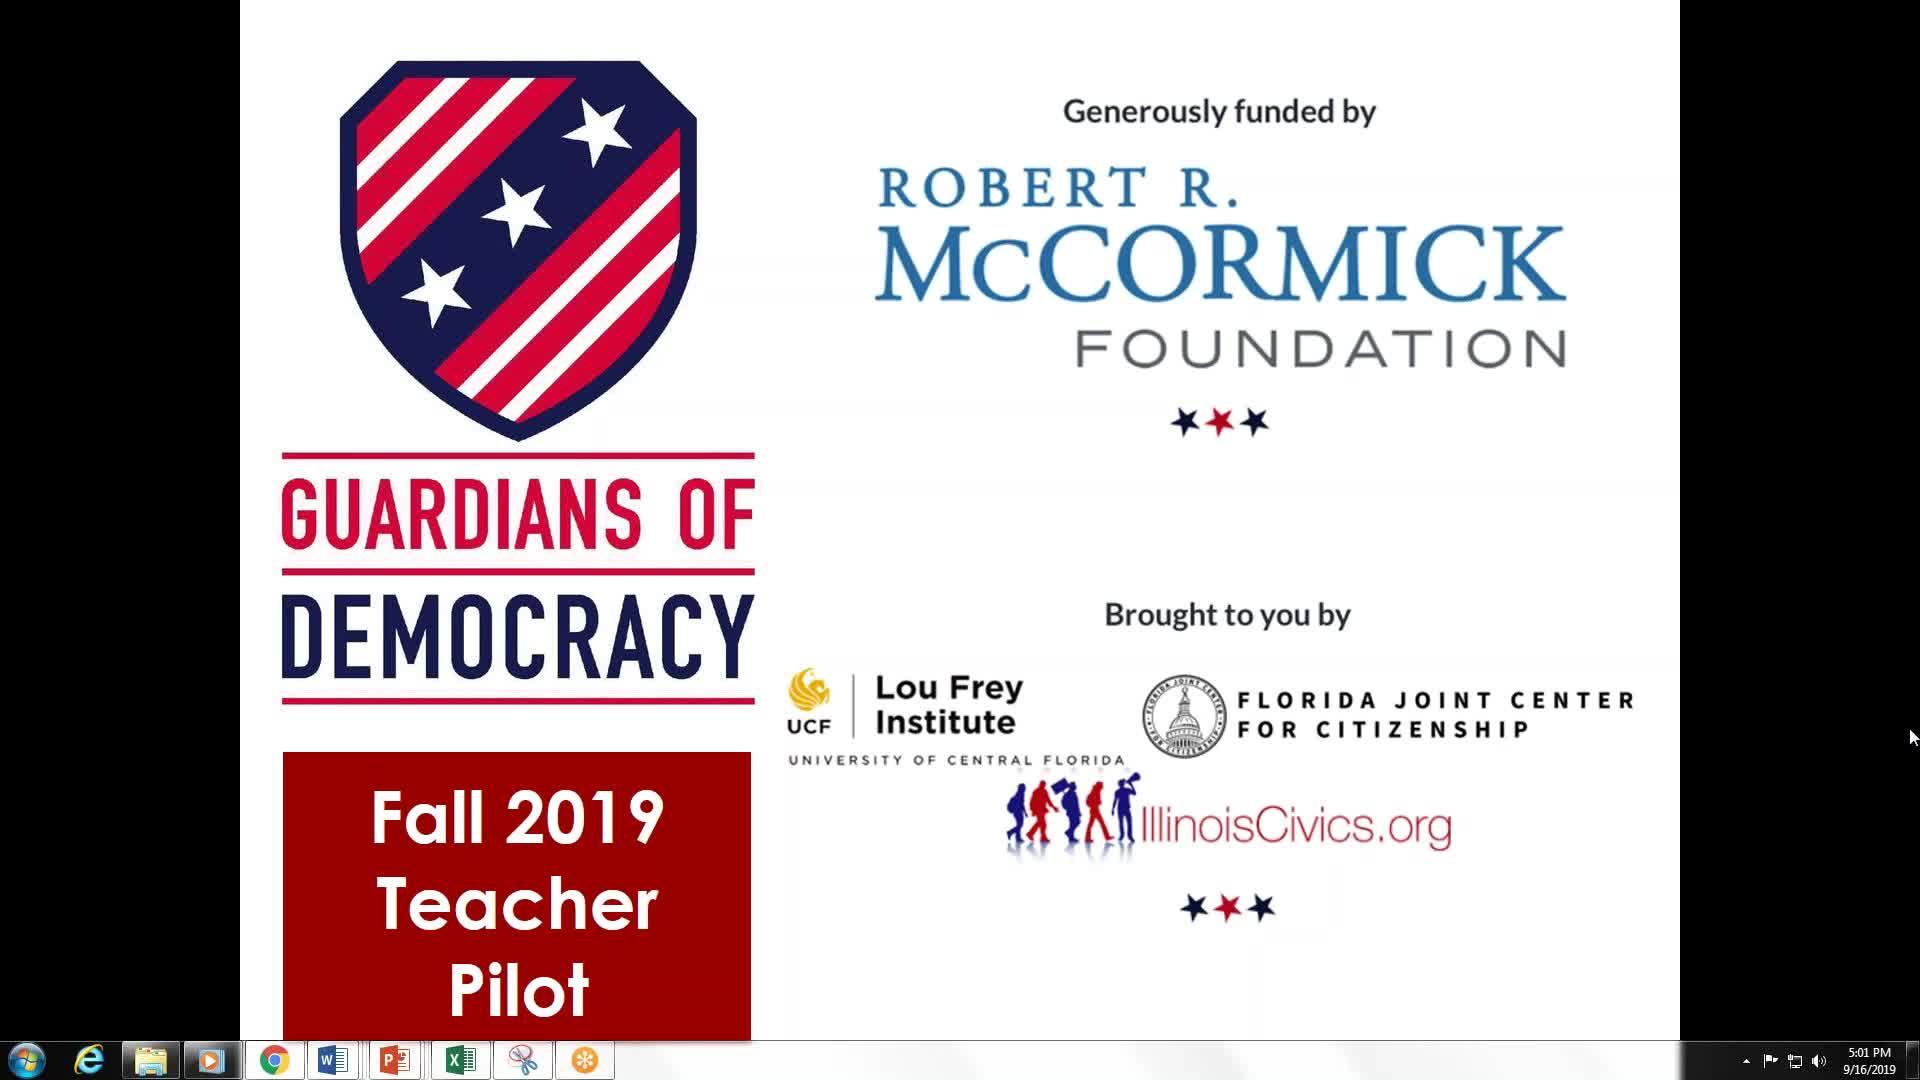 16 Sep 19 Guardians of Democracy Pilot Webinar